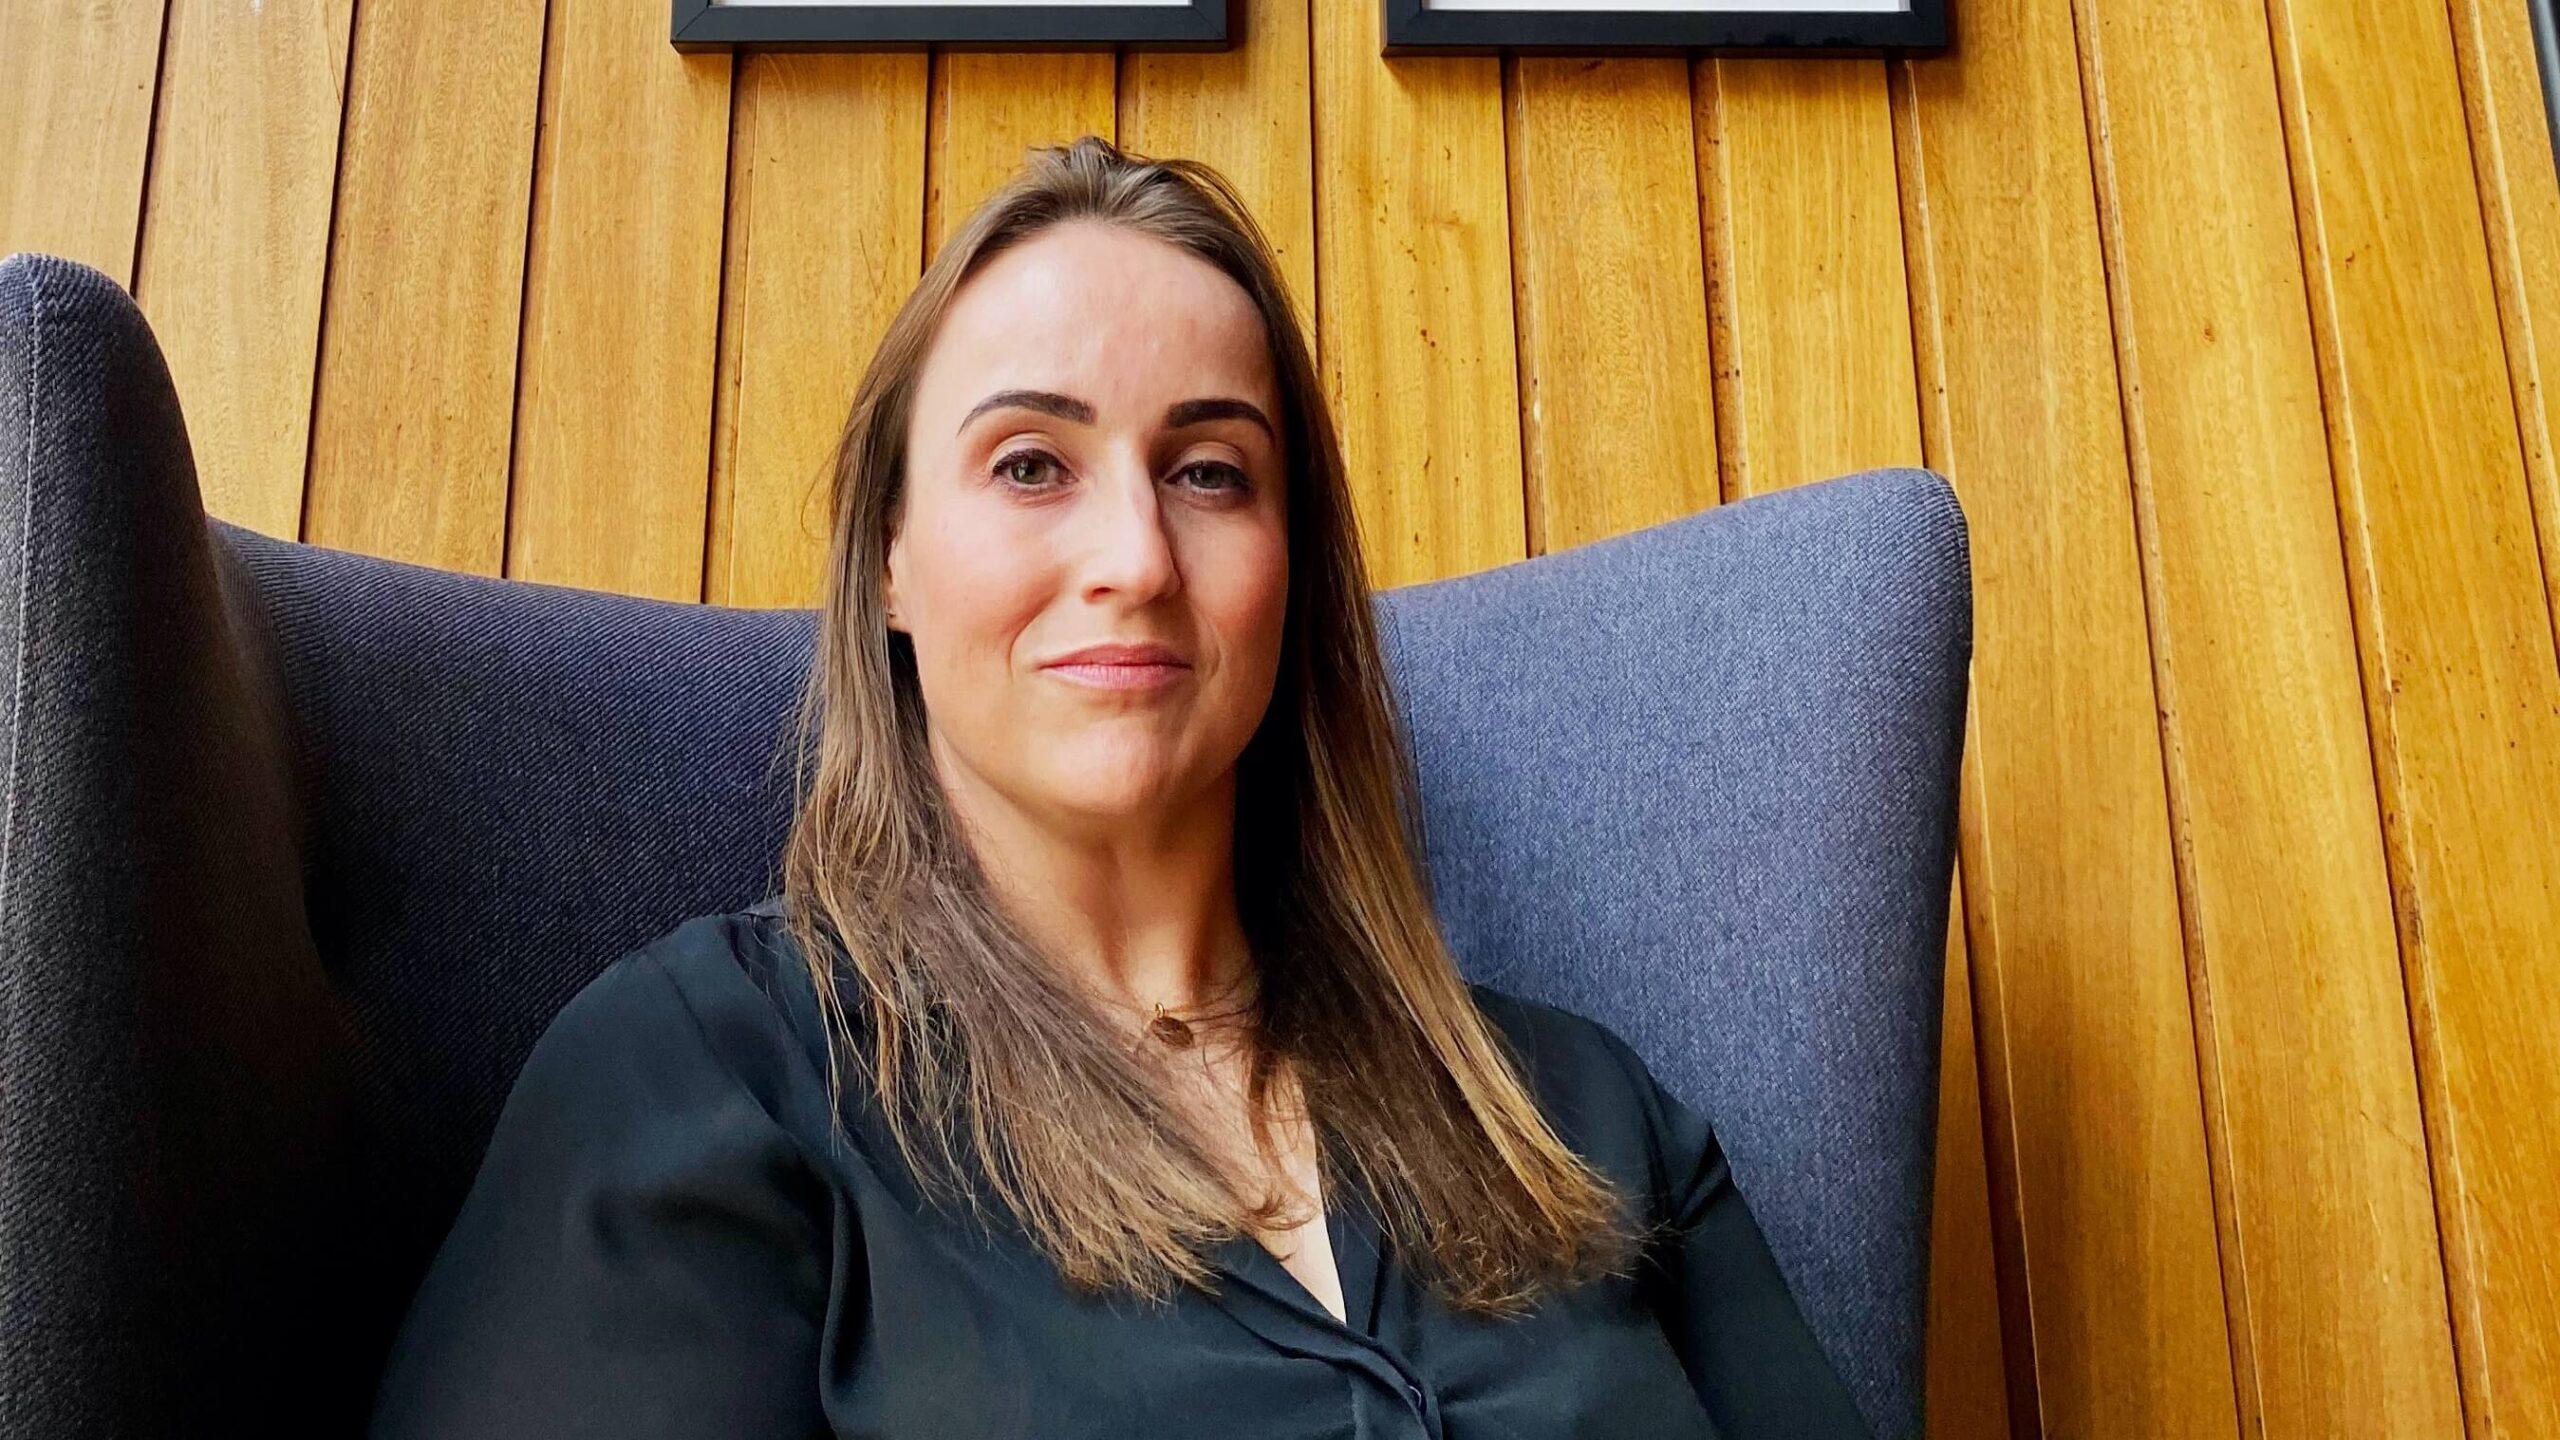 WBDL's Cara Sheppard to run Twickenham Studios